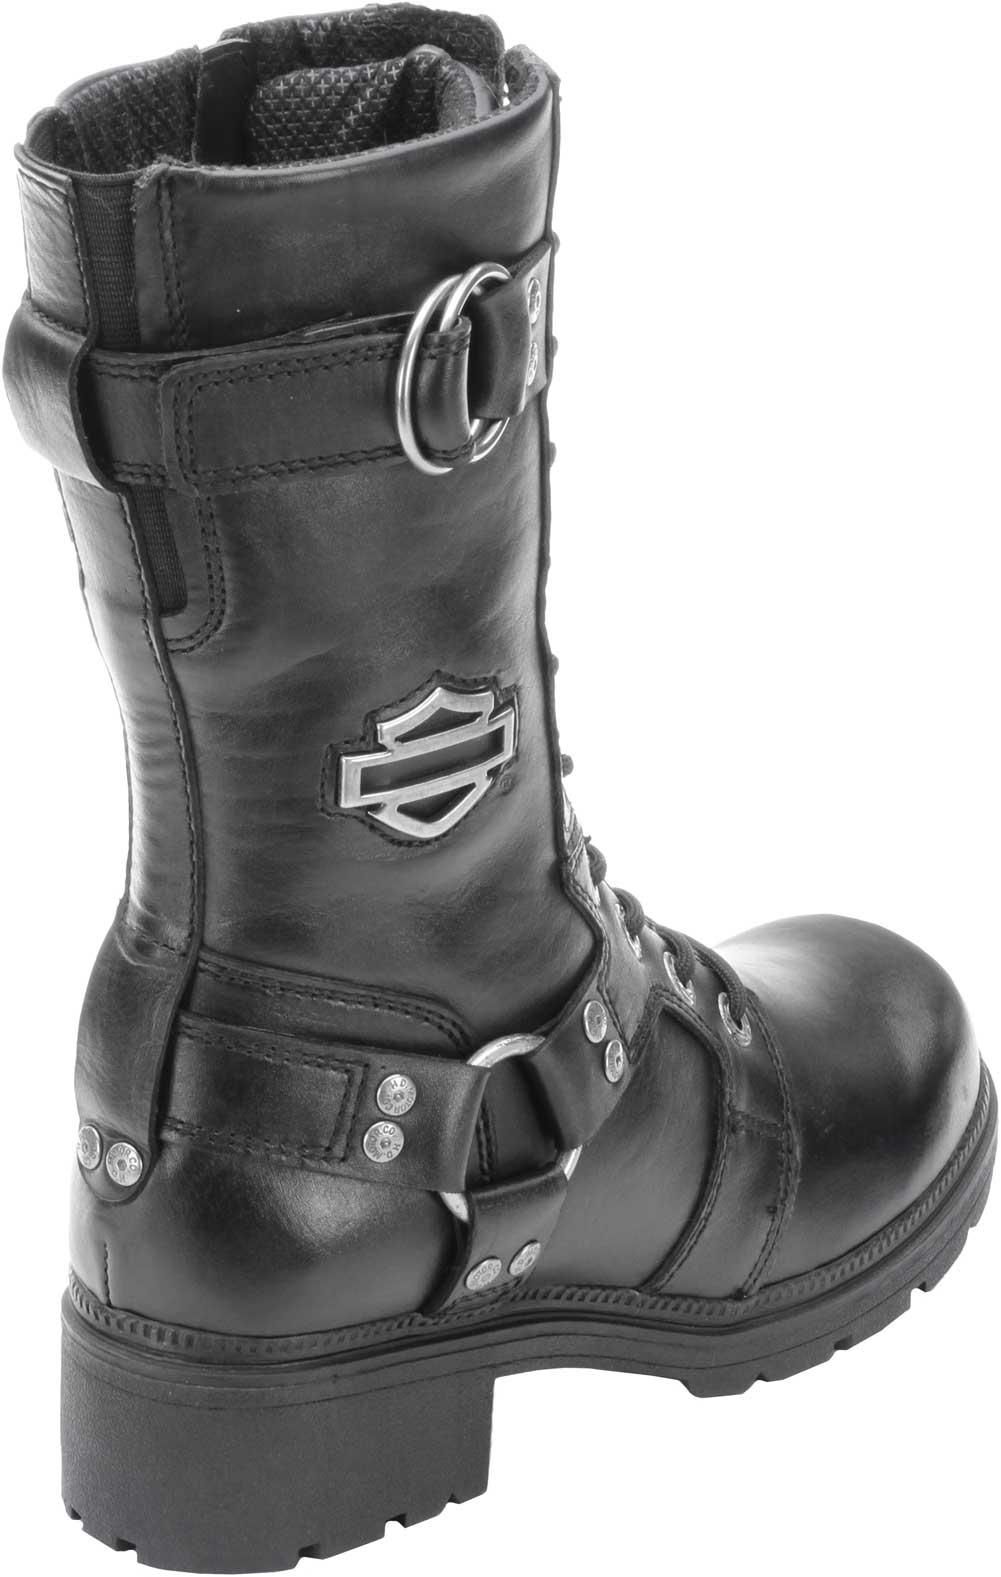 bf53960472d4 Harley-Davidson Women s Eda 9-Inch Boots. Inside Zipper. Lace Front. D83736